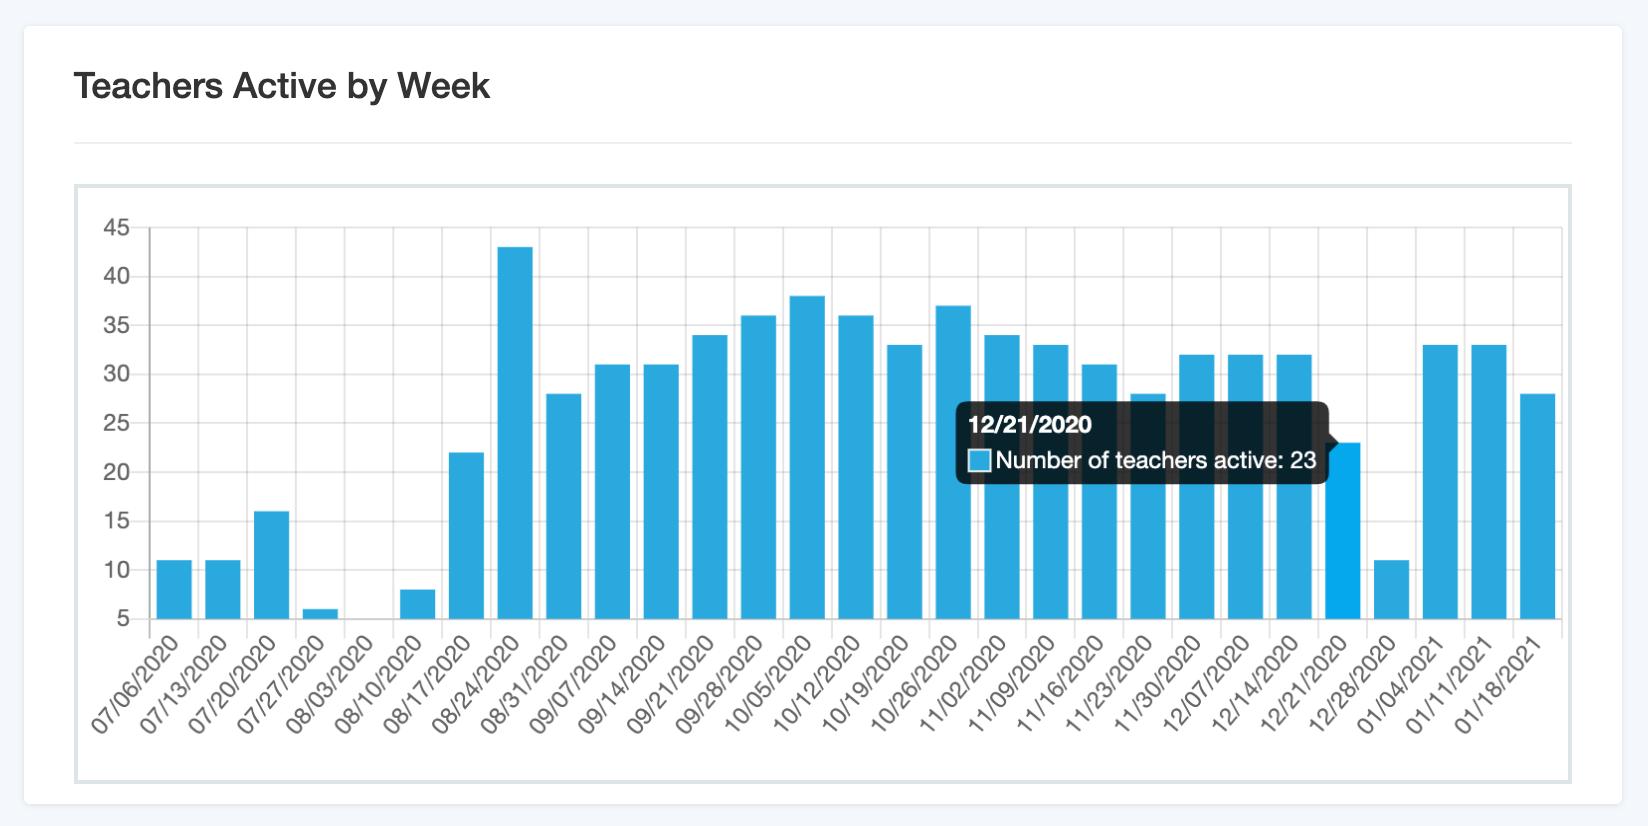 Teacher activity by week